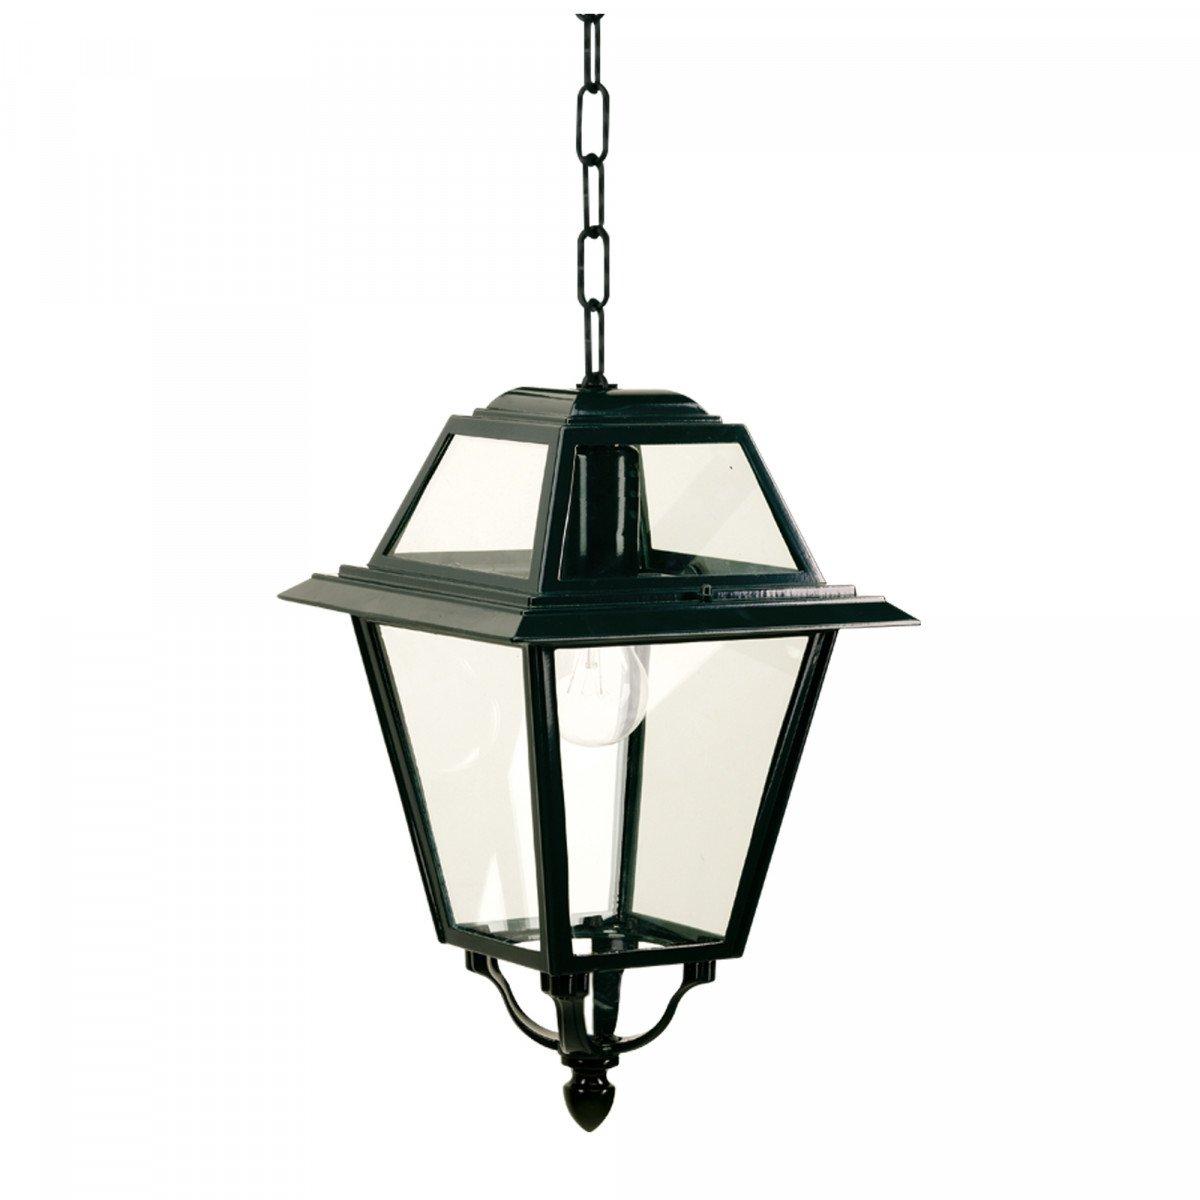 K14A aan ketting (1516) - KS Verlichting - Lampen aan Ketting